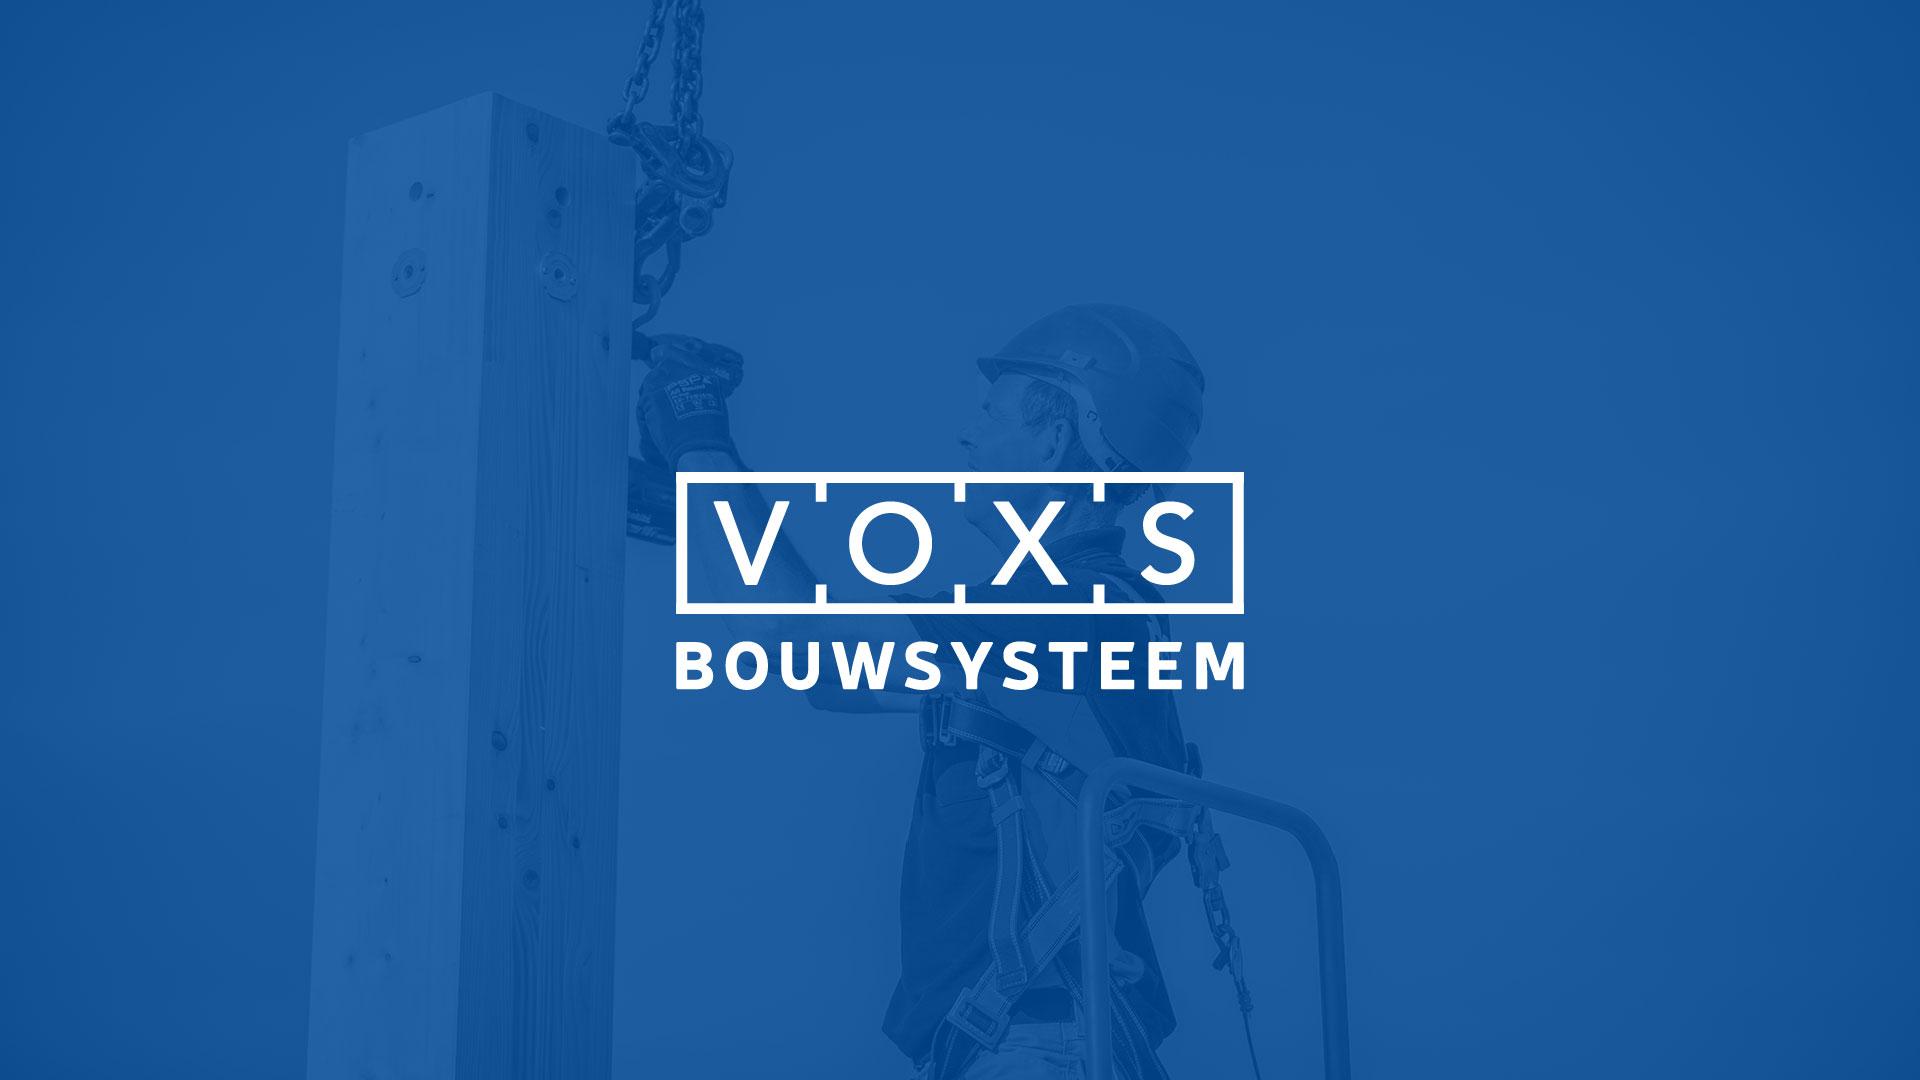 VOXS-005-01-02.jpg